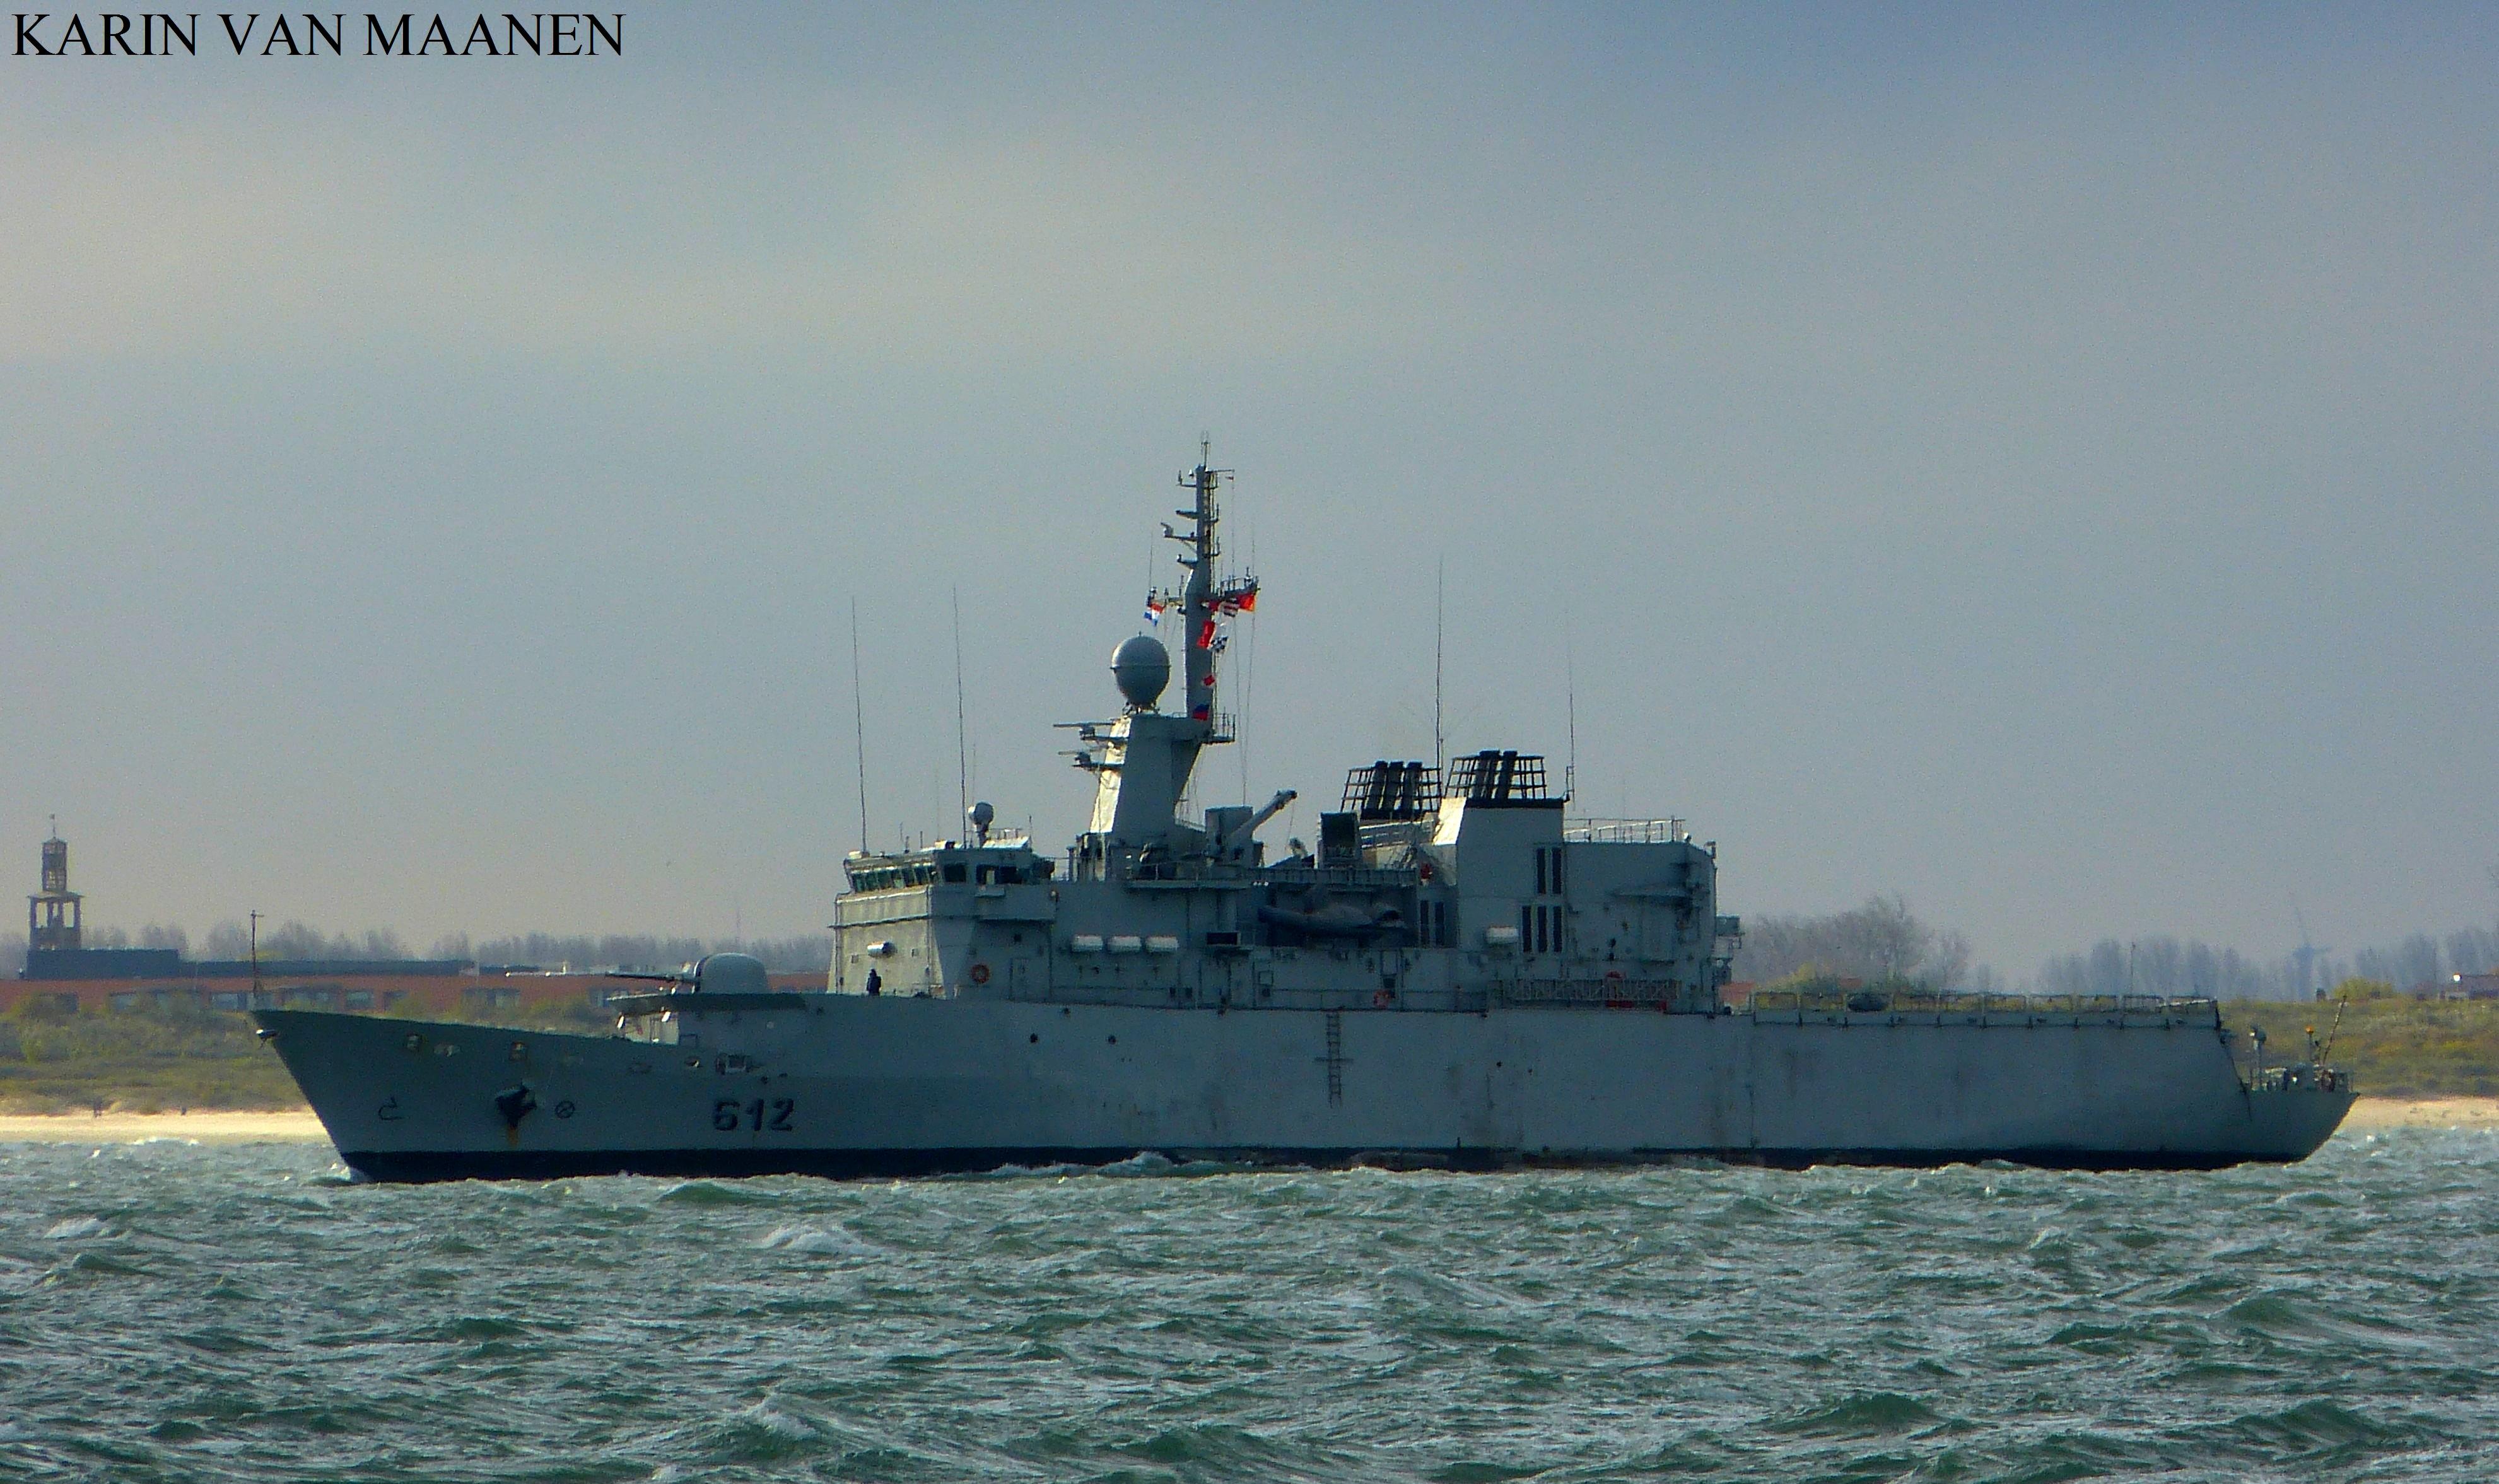 Royal Moroccan Navy Floréal Frigates / Frégates Floréal Marocaines - Page 12 Moroccan_light_surveillance_frigate_hassan_ii_by_roodbaard1958-dbtid2g